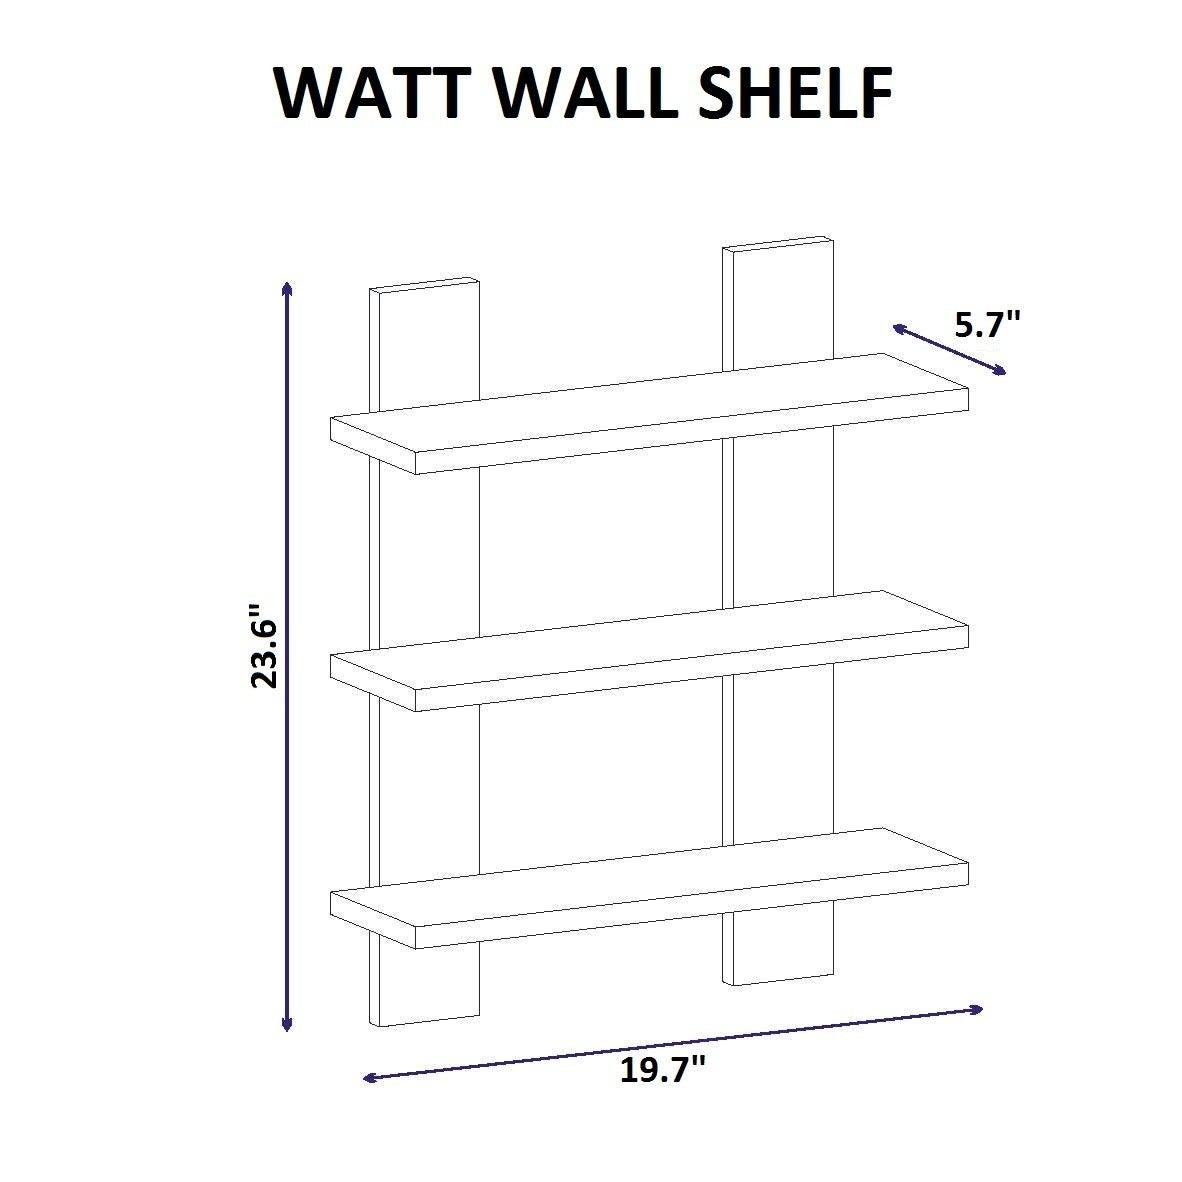 Watt 17 x 24 x 6 modern minimalist wall shelf free shipping watt 17 x 24 x 6 modern minimalist wall shelf free shipping today overstock 21568917 ccuart Image collections